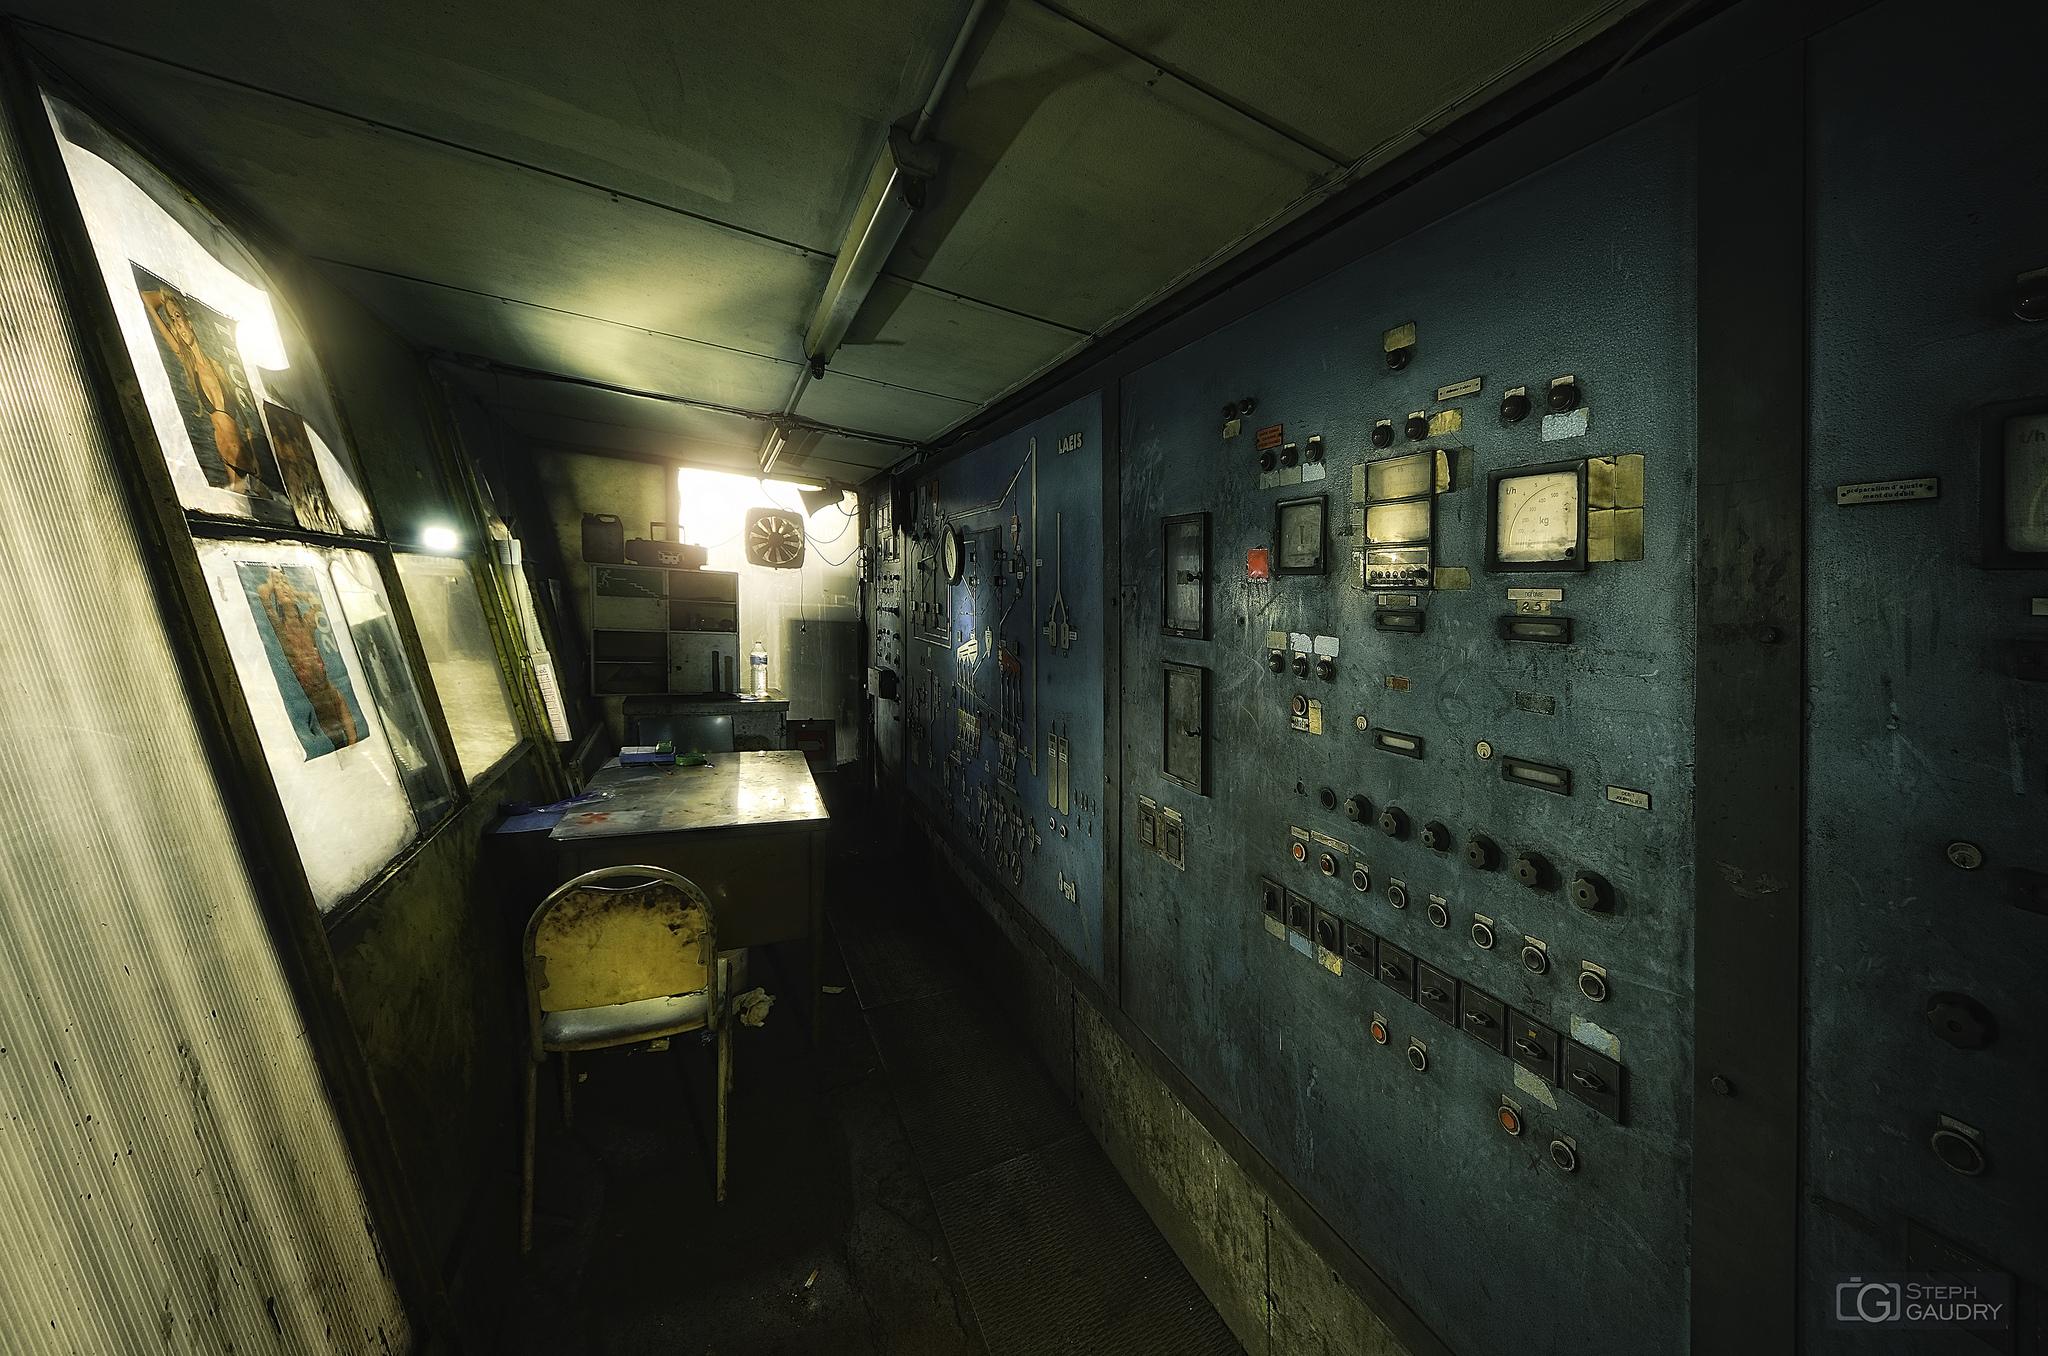 Incinerator office [Click to start slideshow]